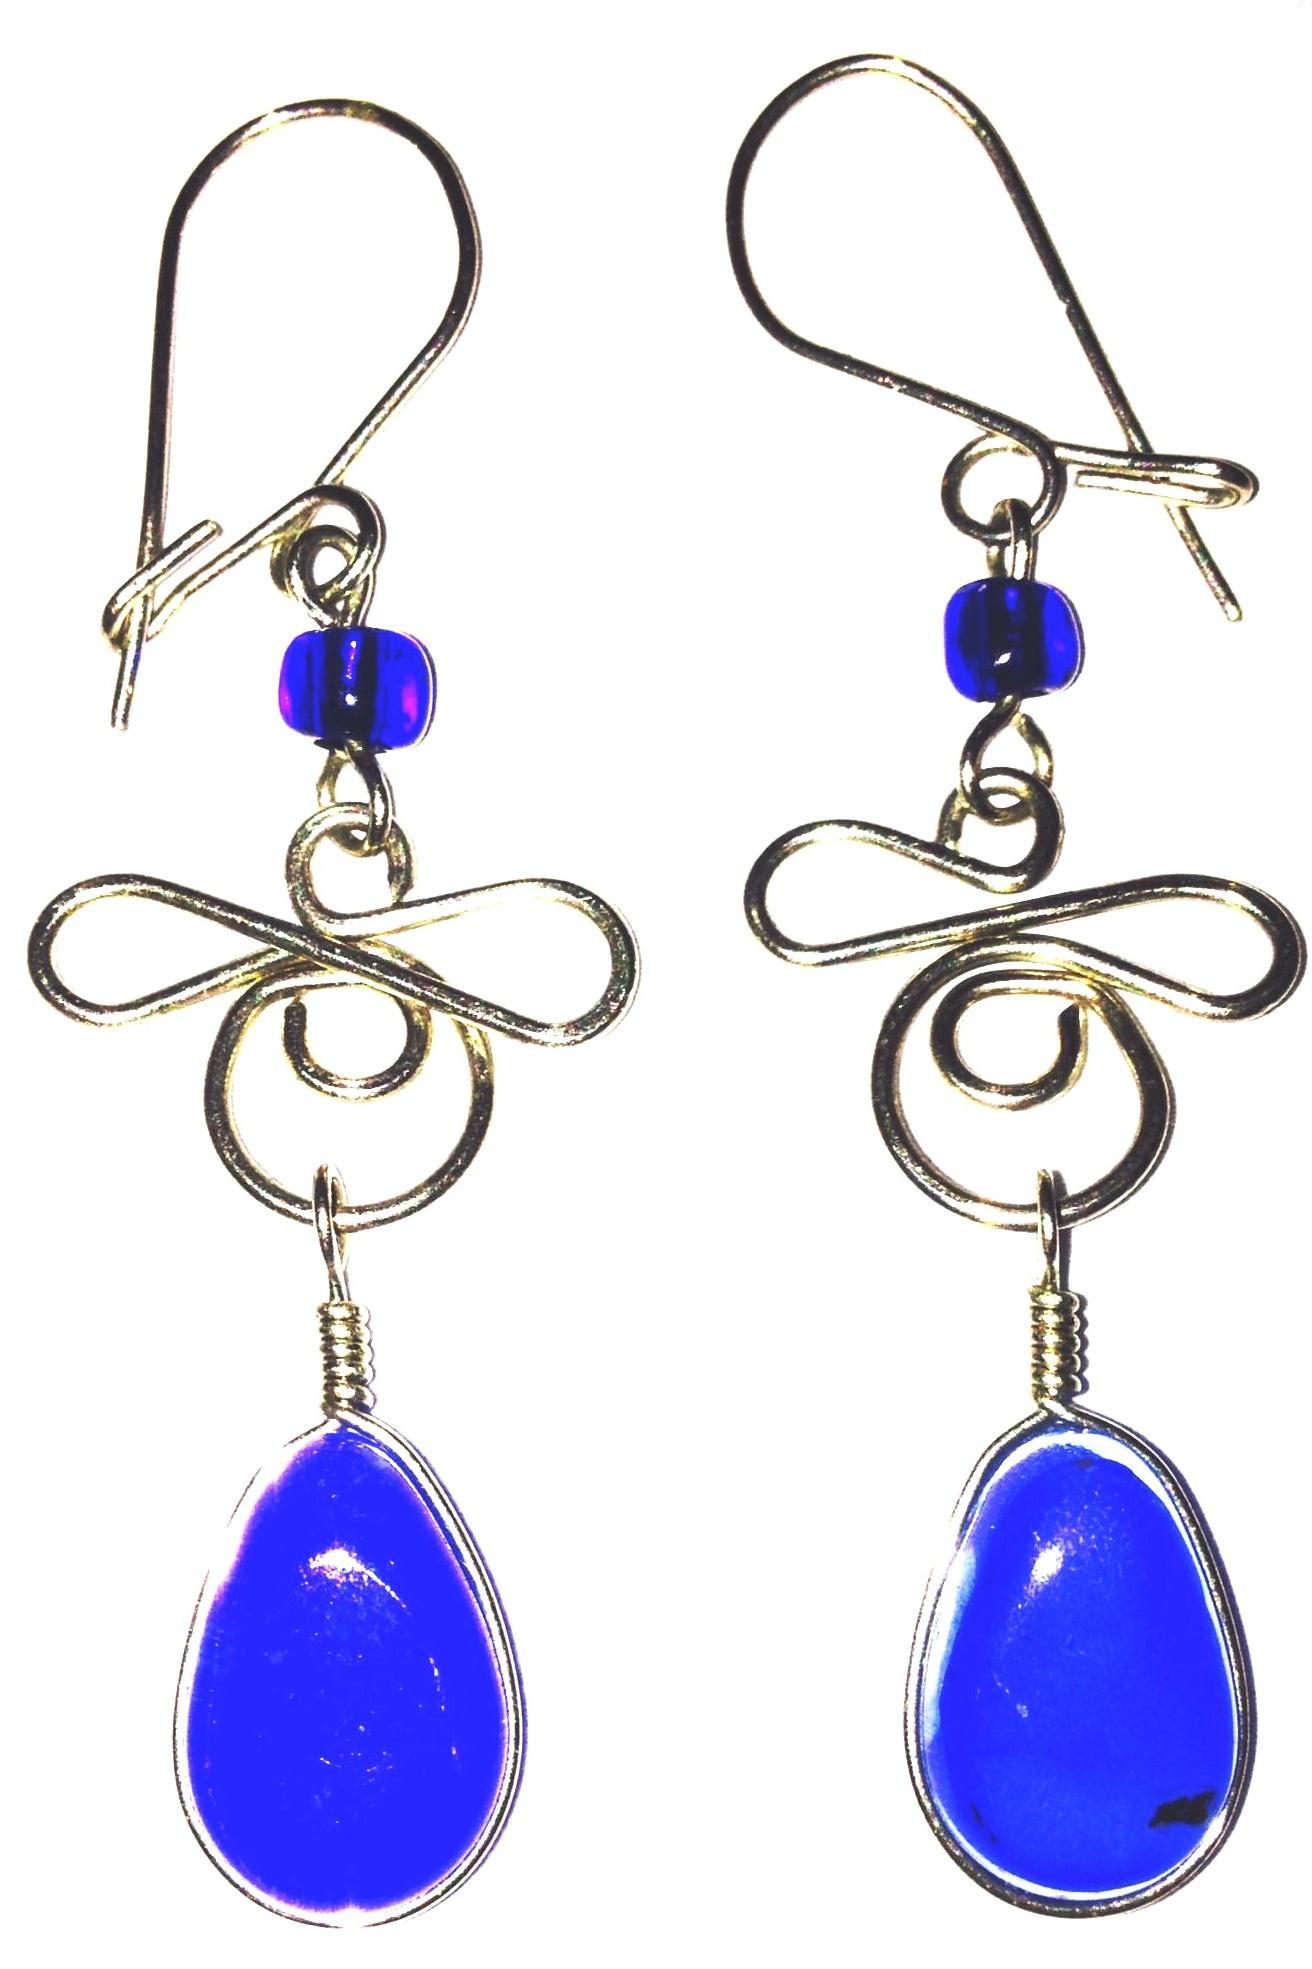 gorgeous_hand_crafted_tibetian_silver_blue_glass_earrings_teardrop_design_earrings_2.jpg